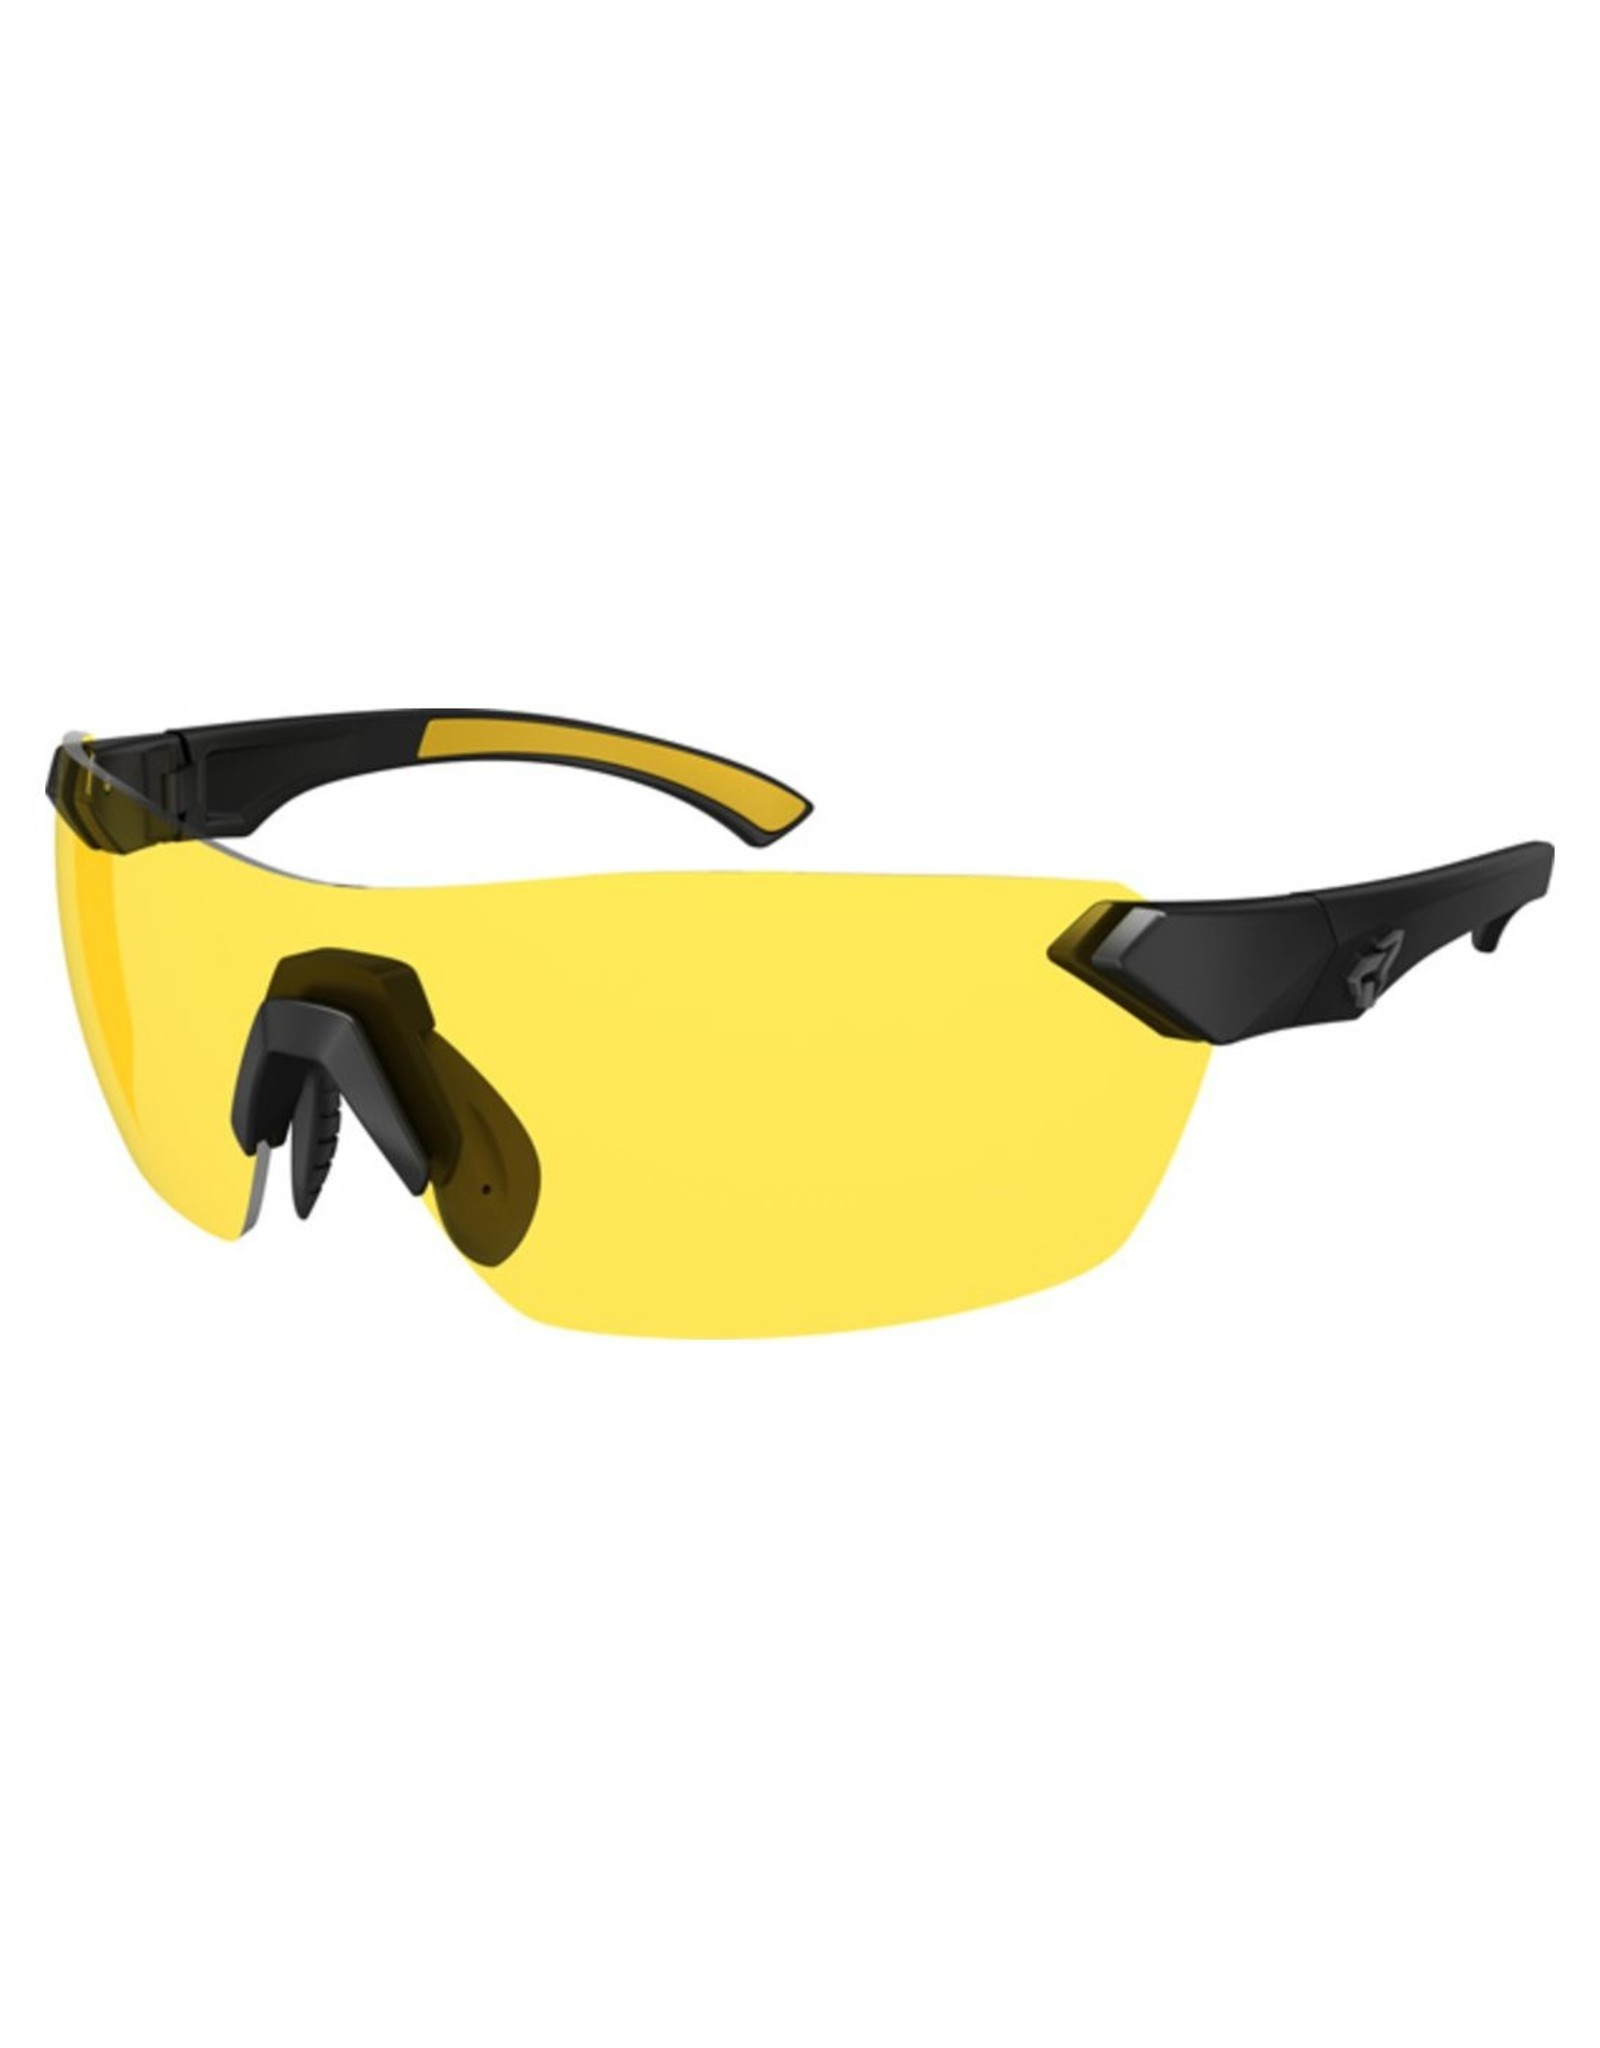 Ryders Eyewear - Nimby Poly Matte Black-Yellow/Yellow Lens